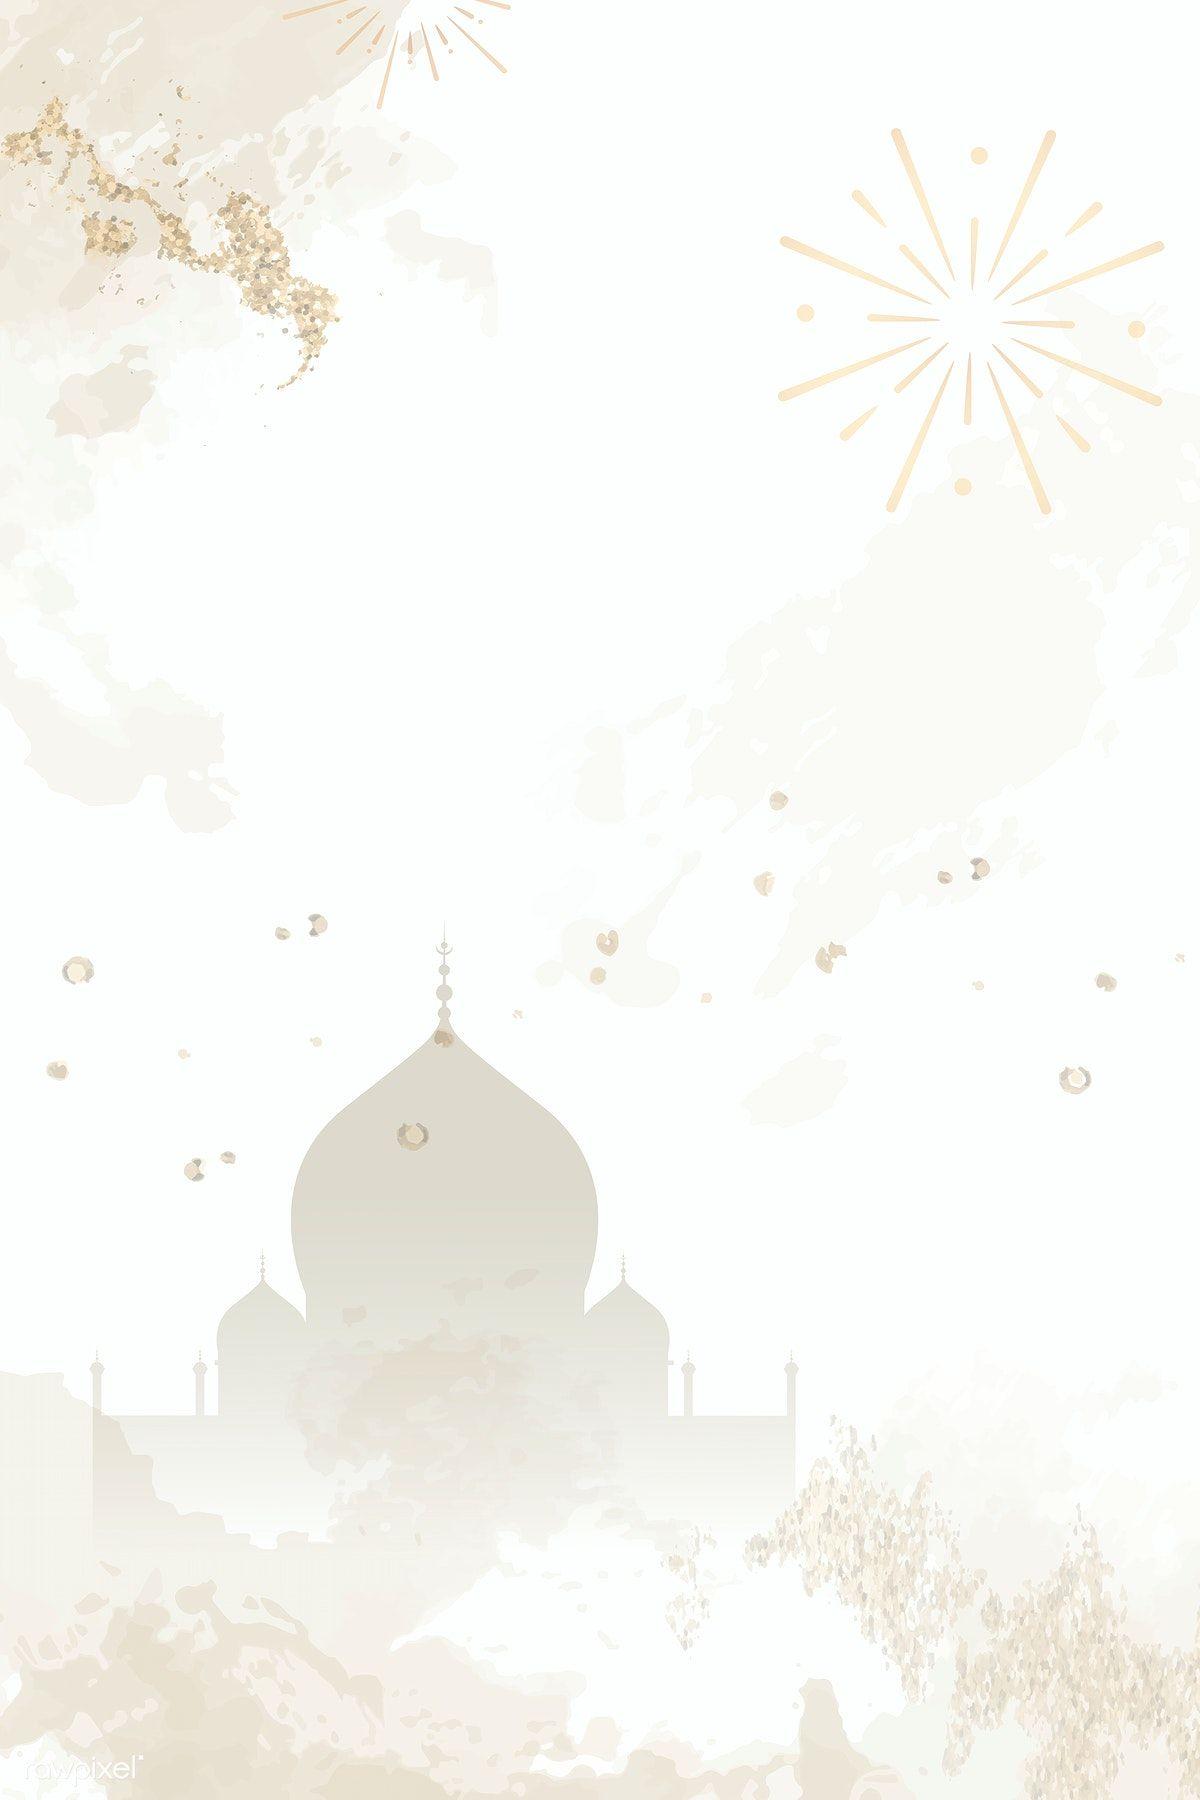 Background Abstrak Islami : background, abstrak, islami, Diwali, Festival, Patterned, Background, Vector, Premium, Image, Rawpixel.com, Abstrak,, Poster, Lukisan, Keluarga